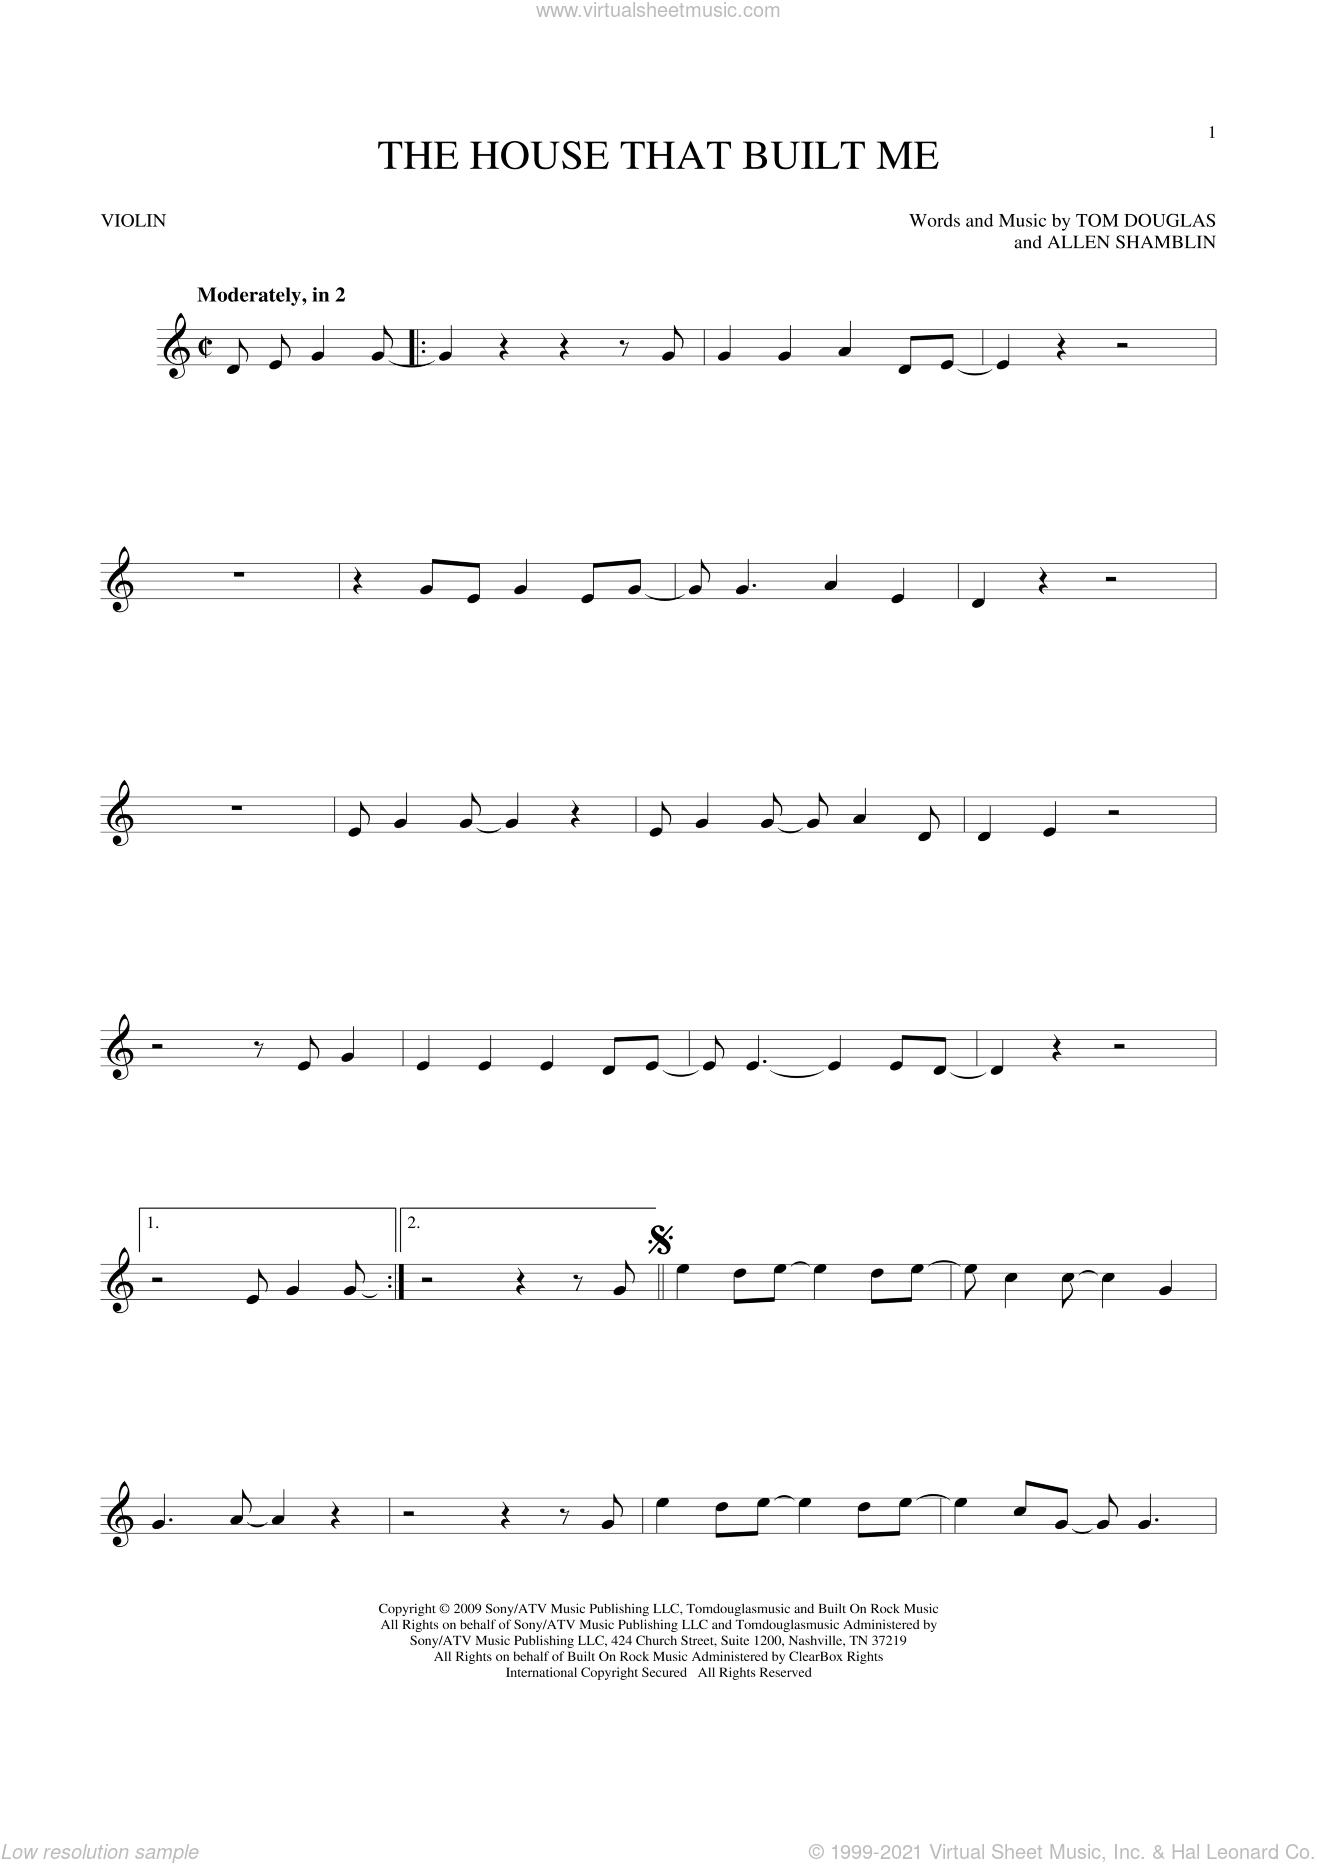 The House That Built Me sheet music for violin solo by Miranda Lambert, Allen Shamblin and Tom Douglas, intermediate skill level